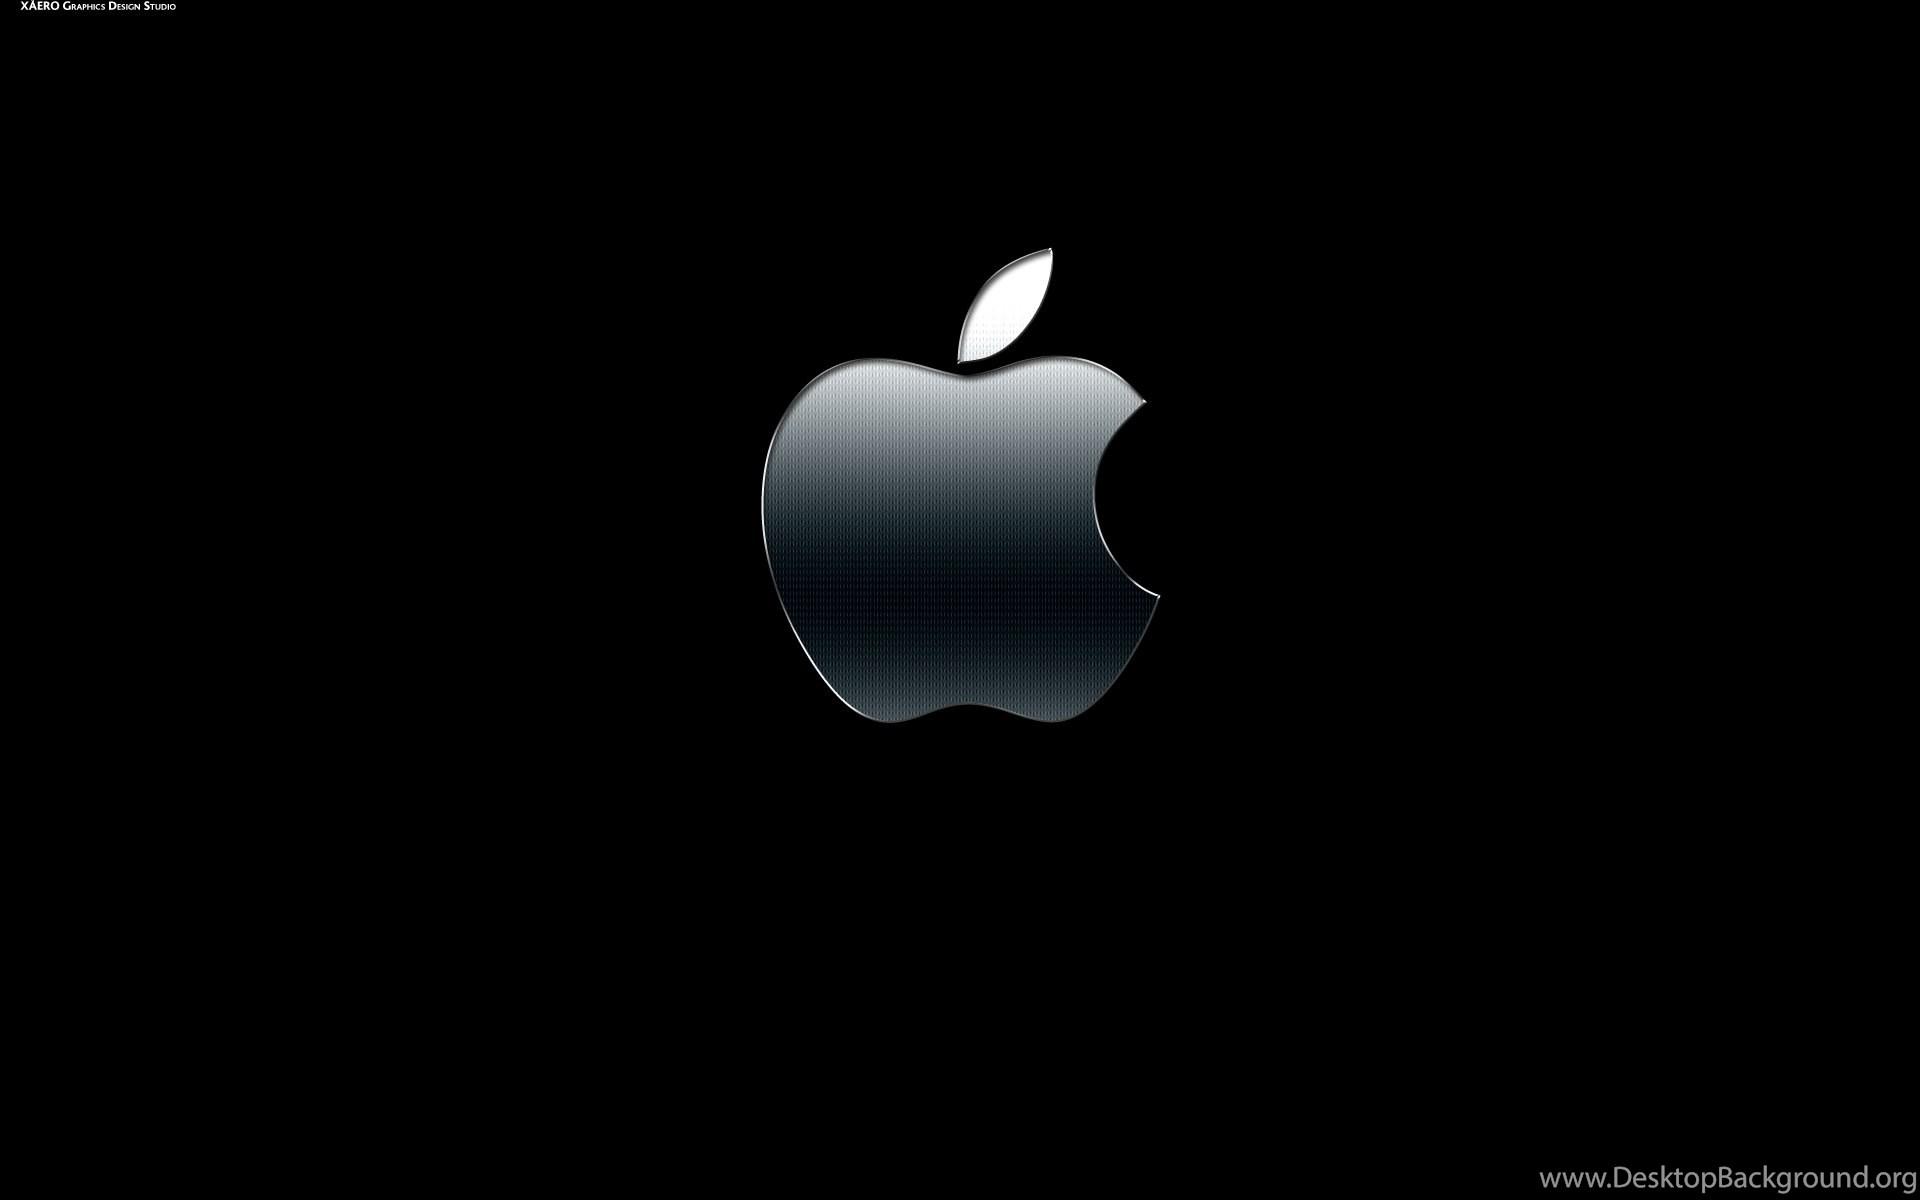 Cool wallpapers apple live wallpapers hd for windows 7 desktop widescreen voltagebd Gallery